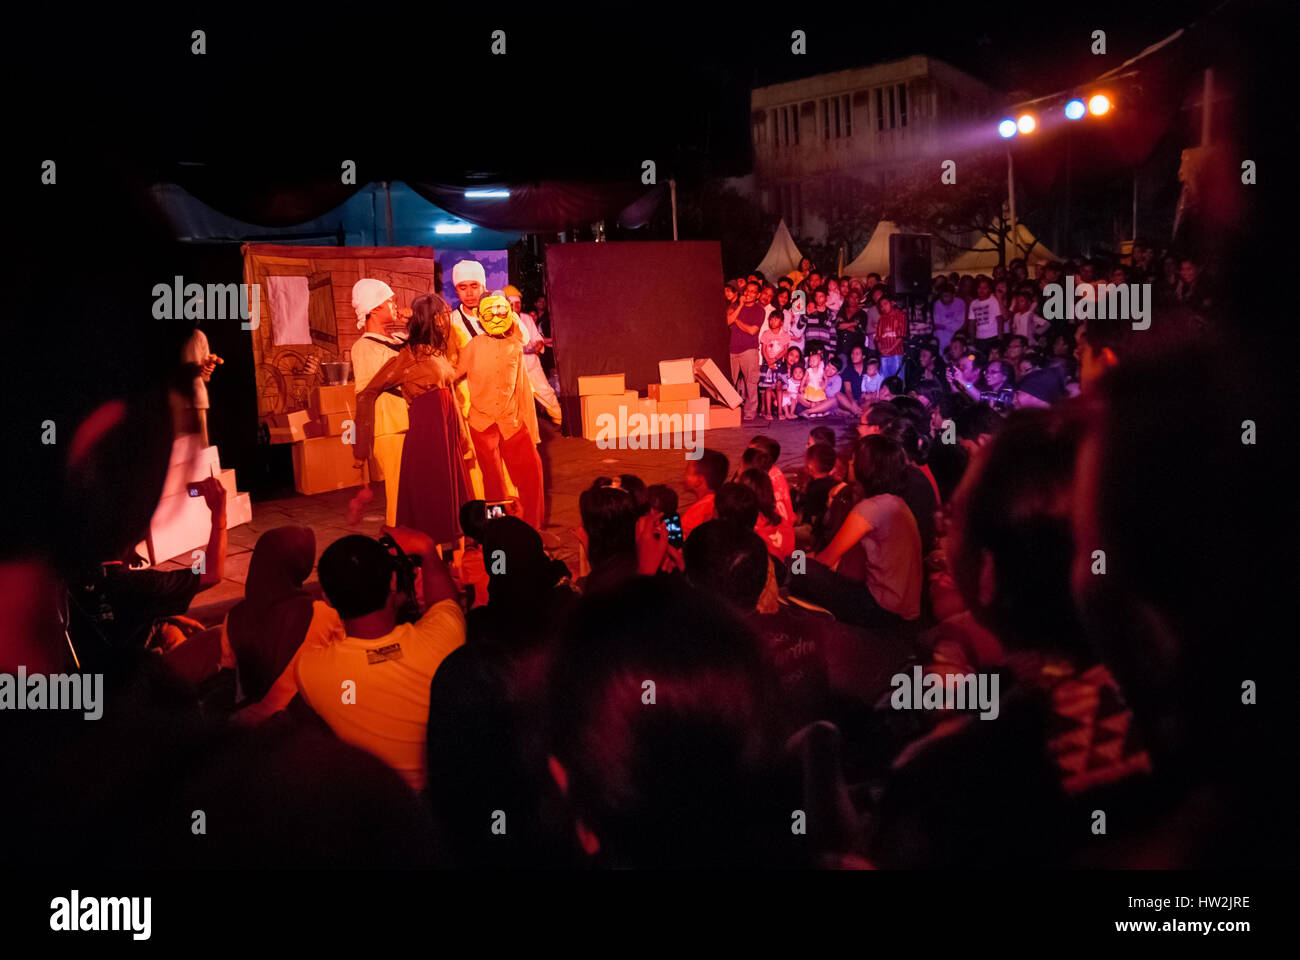 "Menschenmenge beobachten das Papermoon Puppentheater zeigen unter dem Titel ""SirdusKarkus"" auf dem Platz Stockbild"